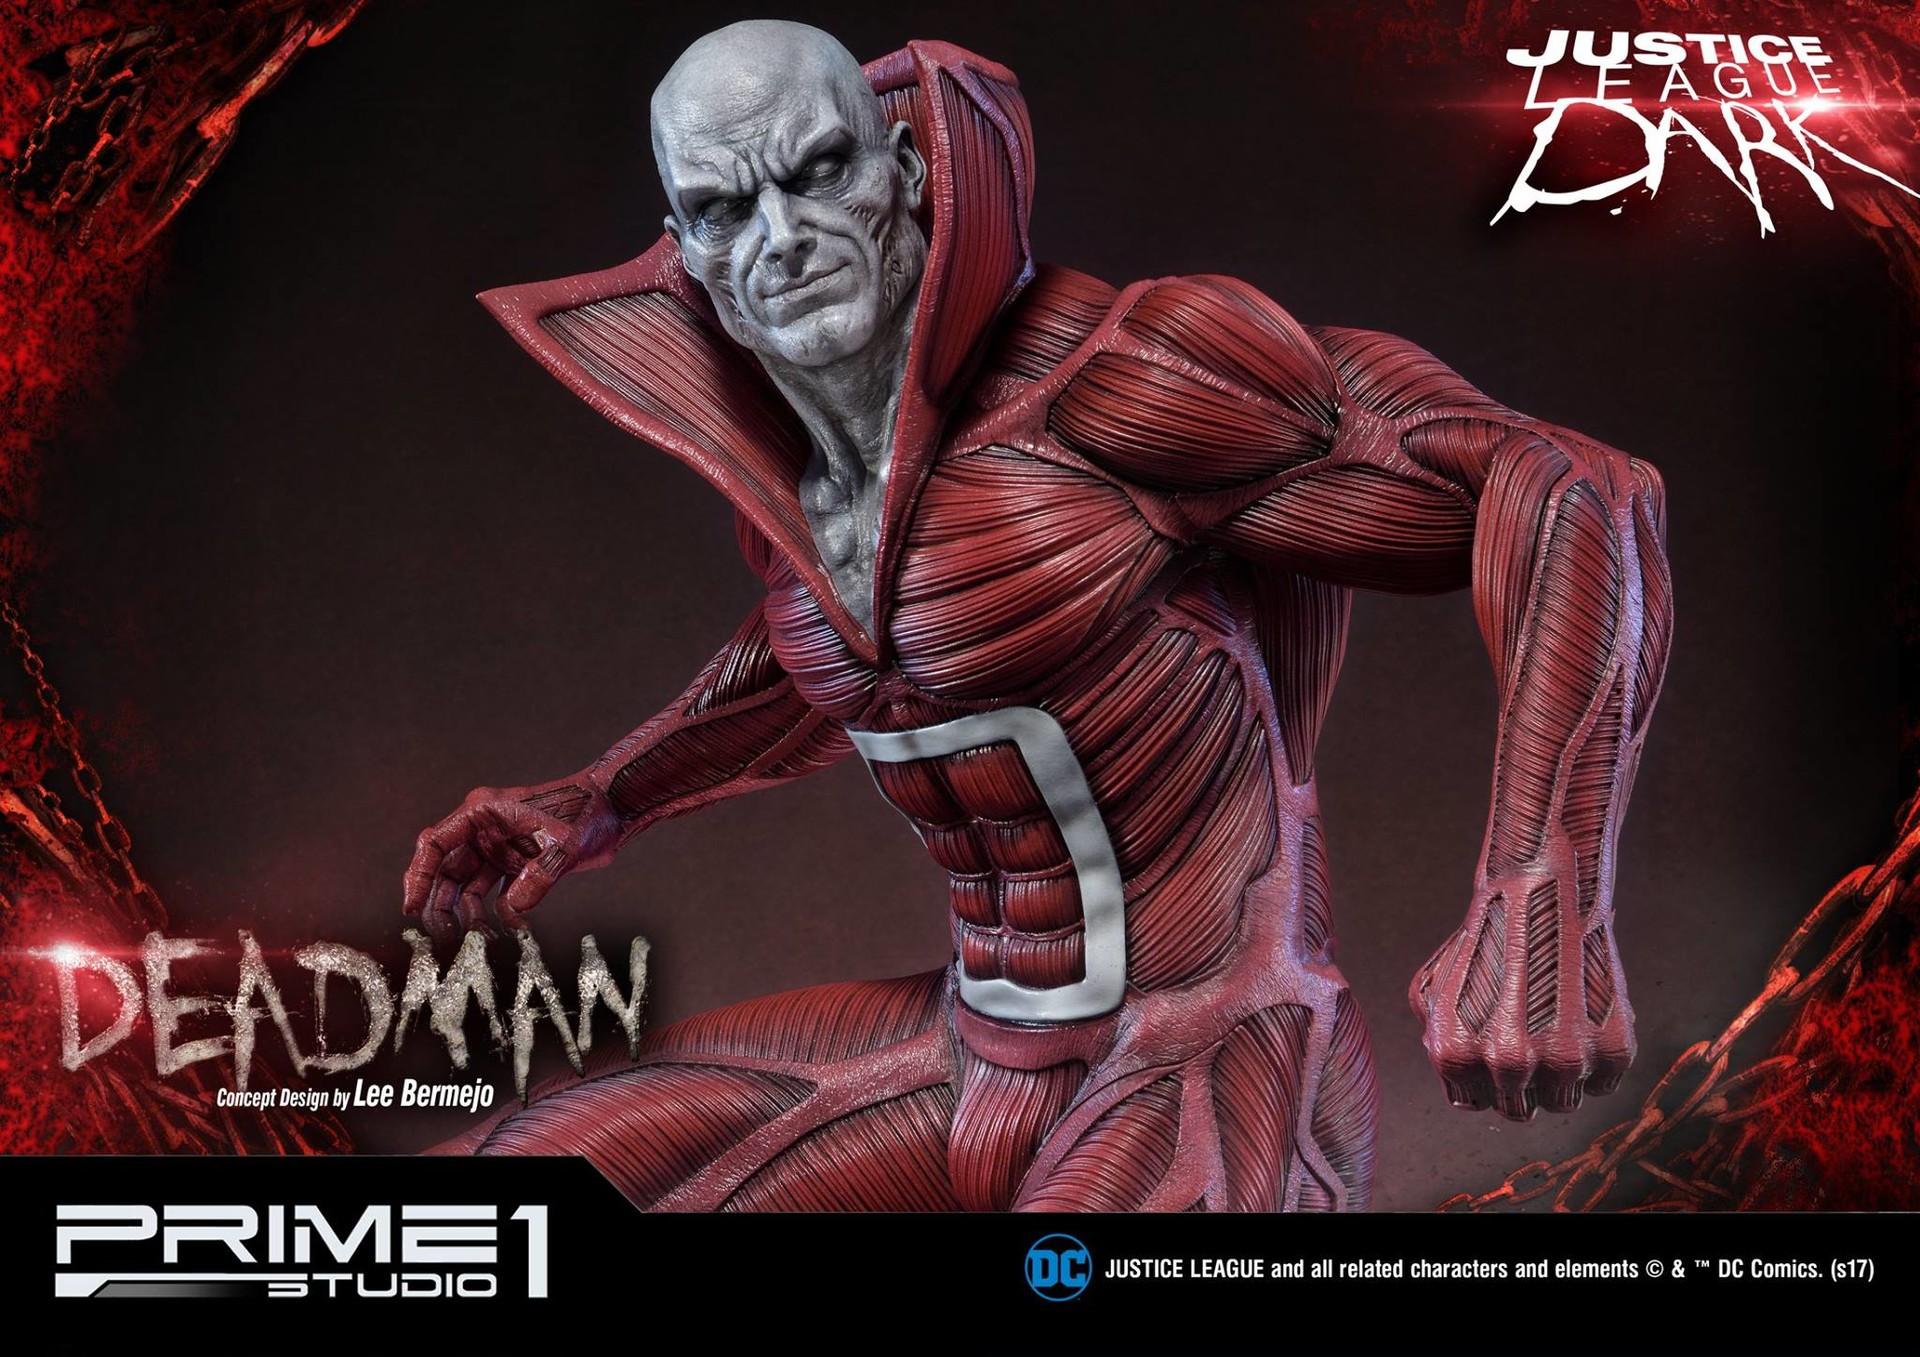 Bernardo cruzeiro prime 1 deadman statue 014